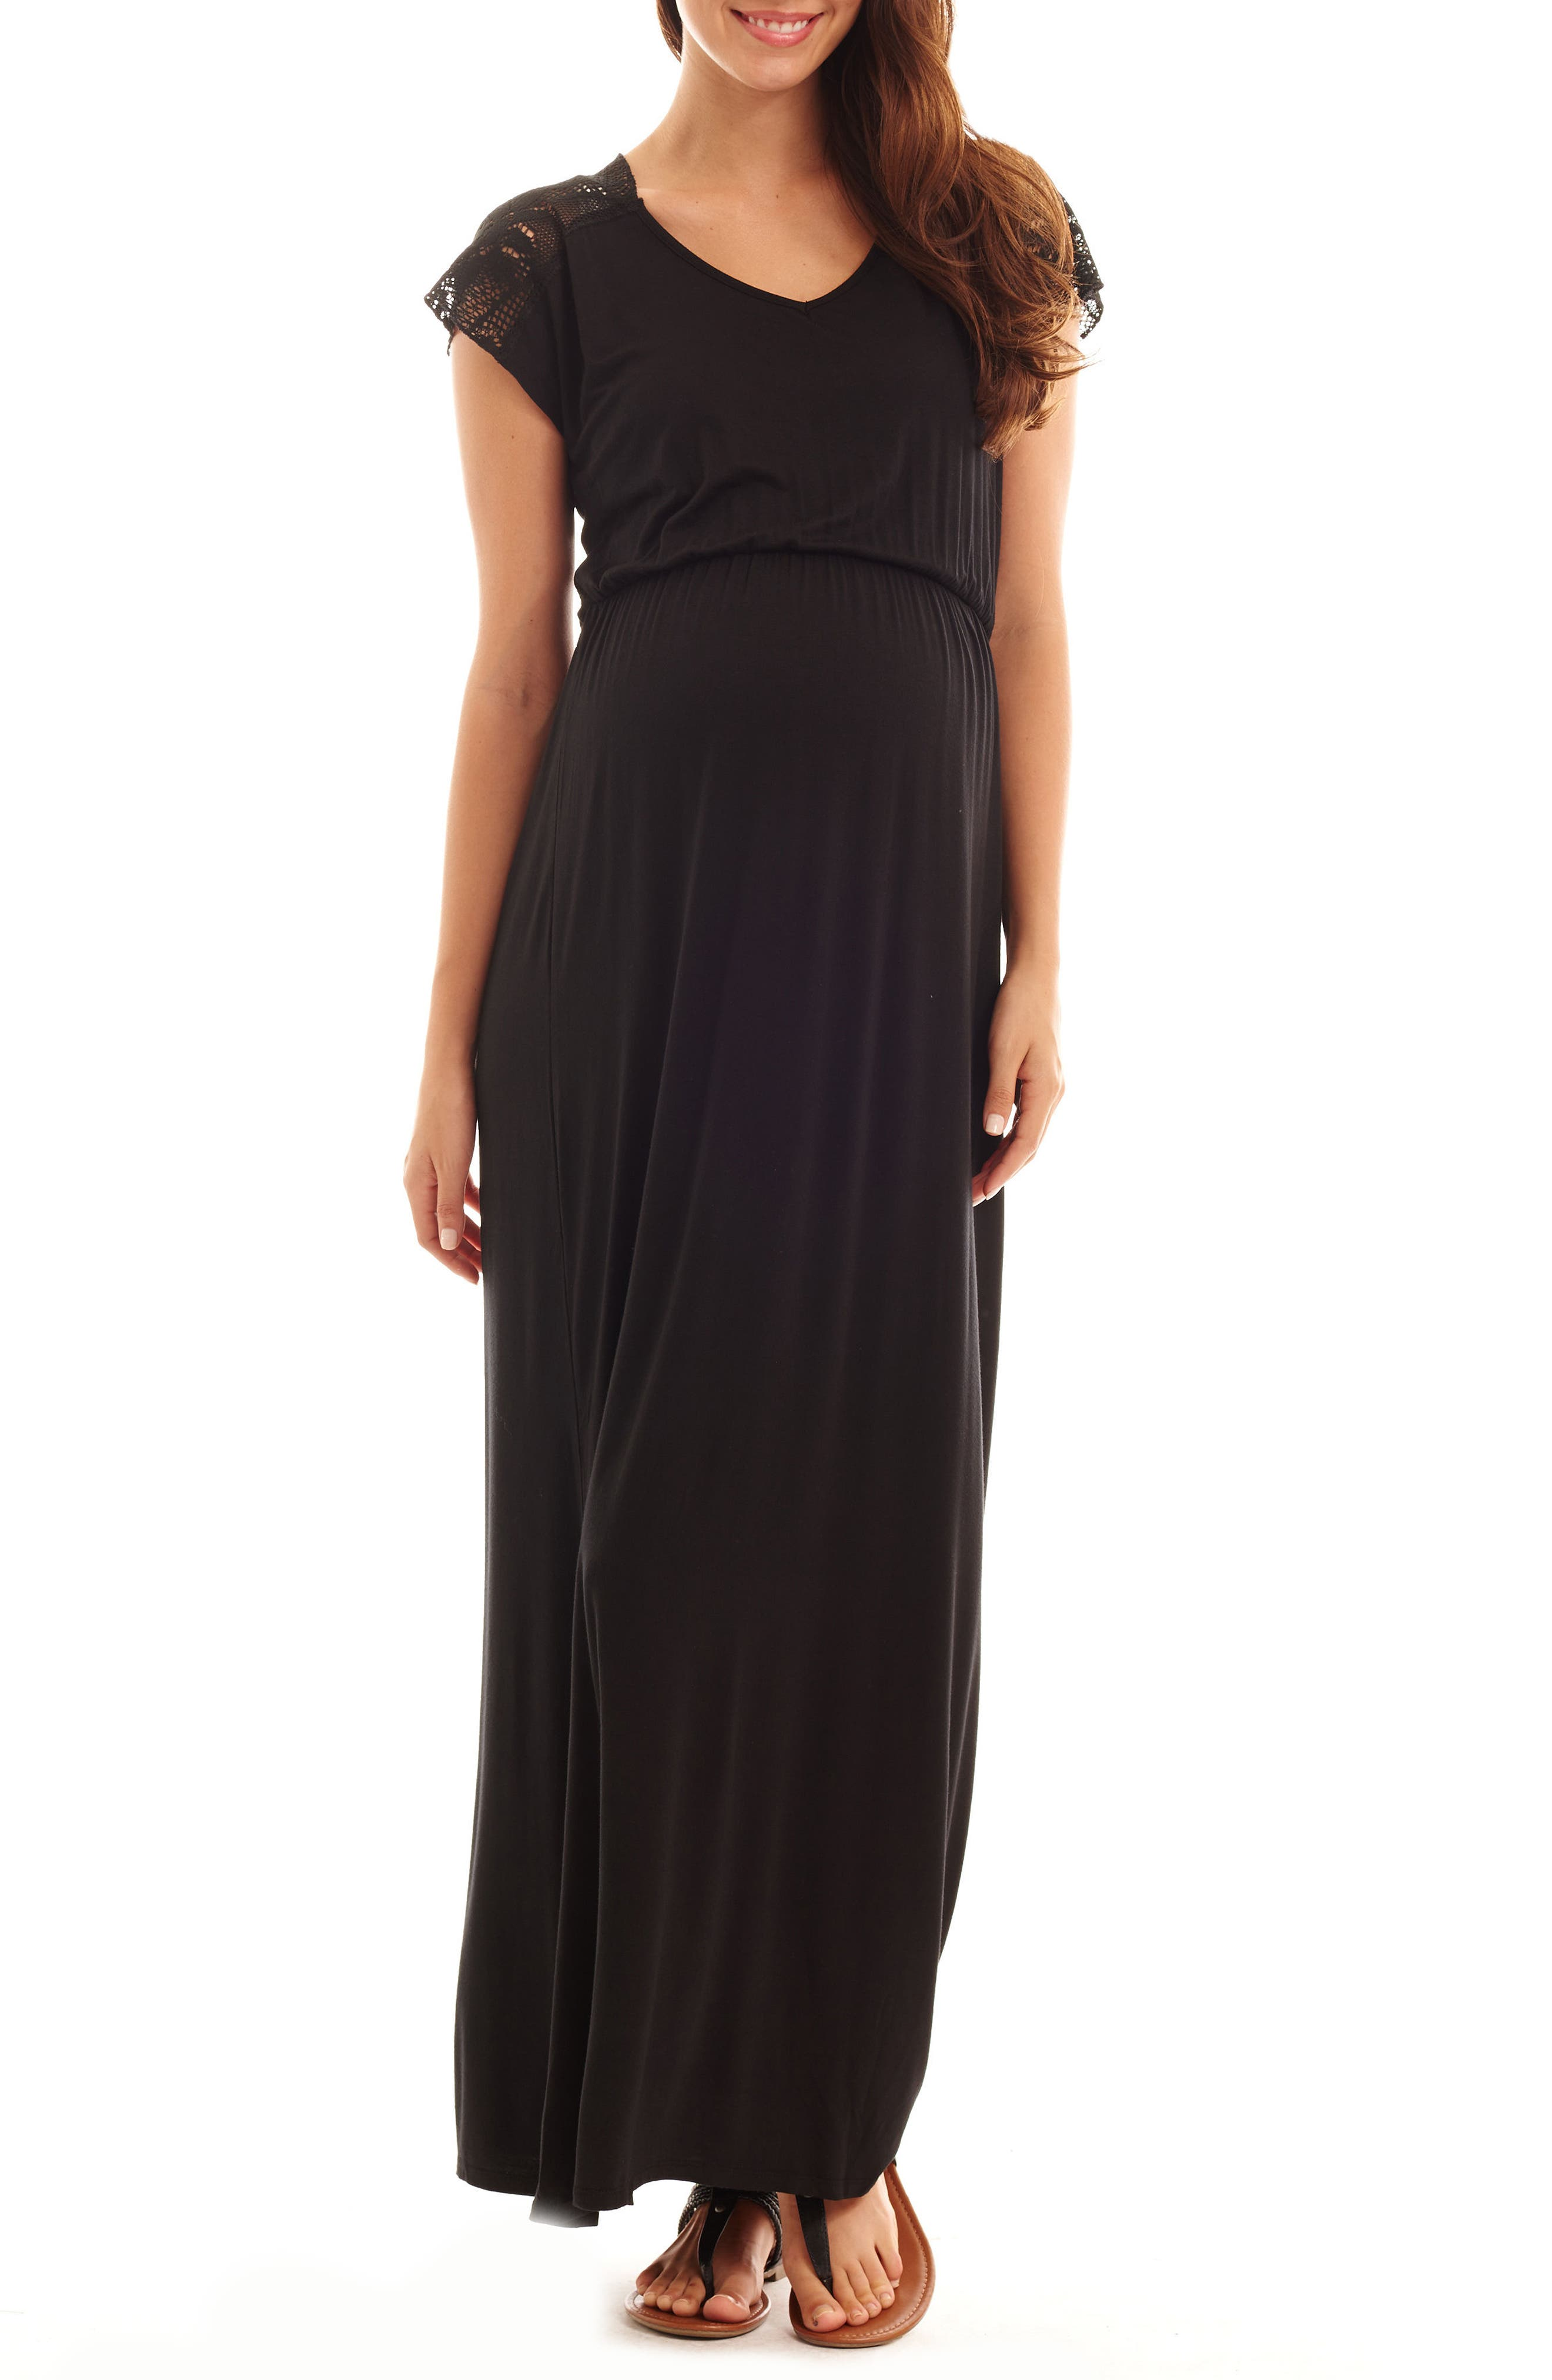 Everly Grey Margaret Maternity/nursing Maxi Dress, Black